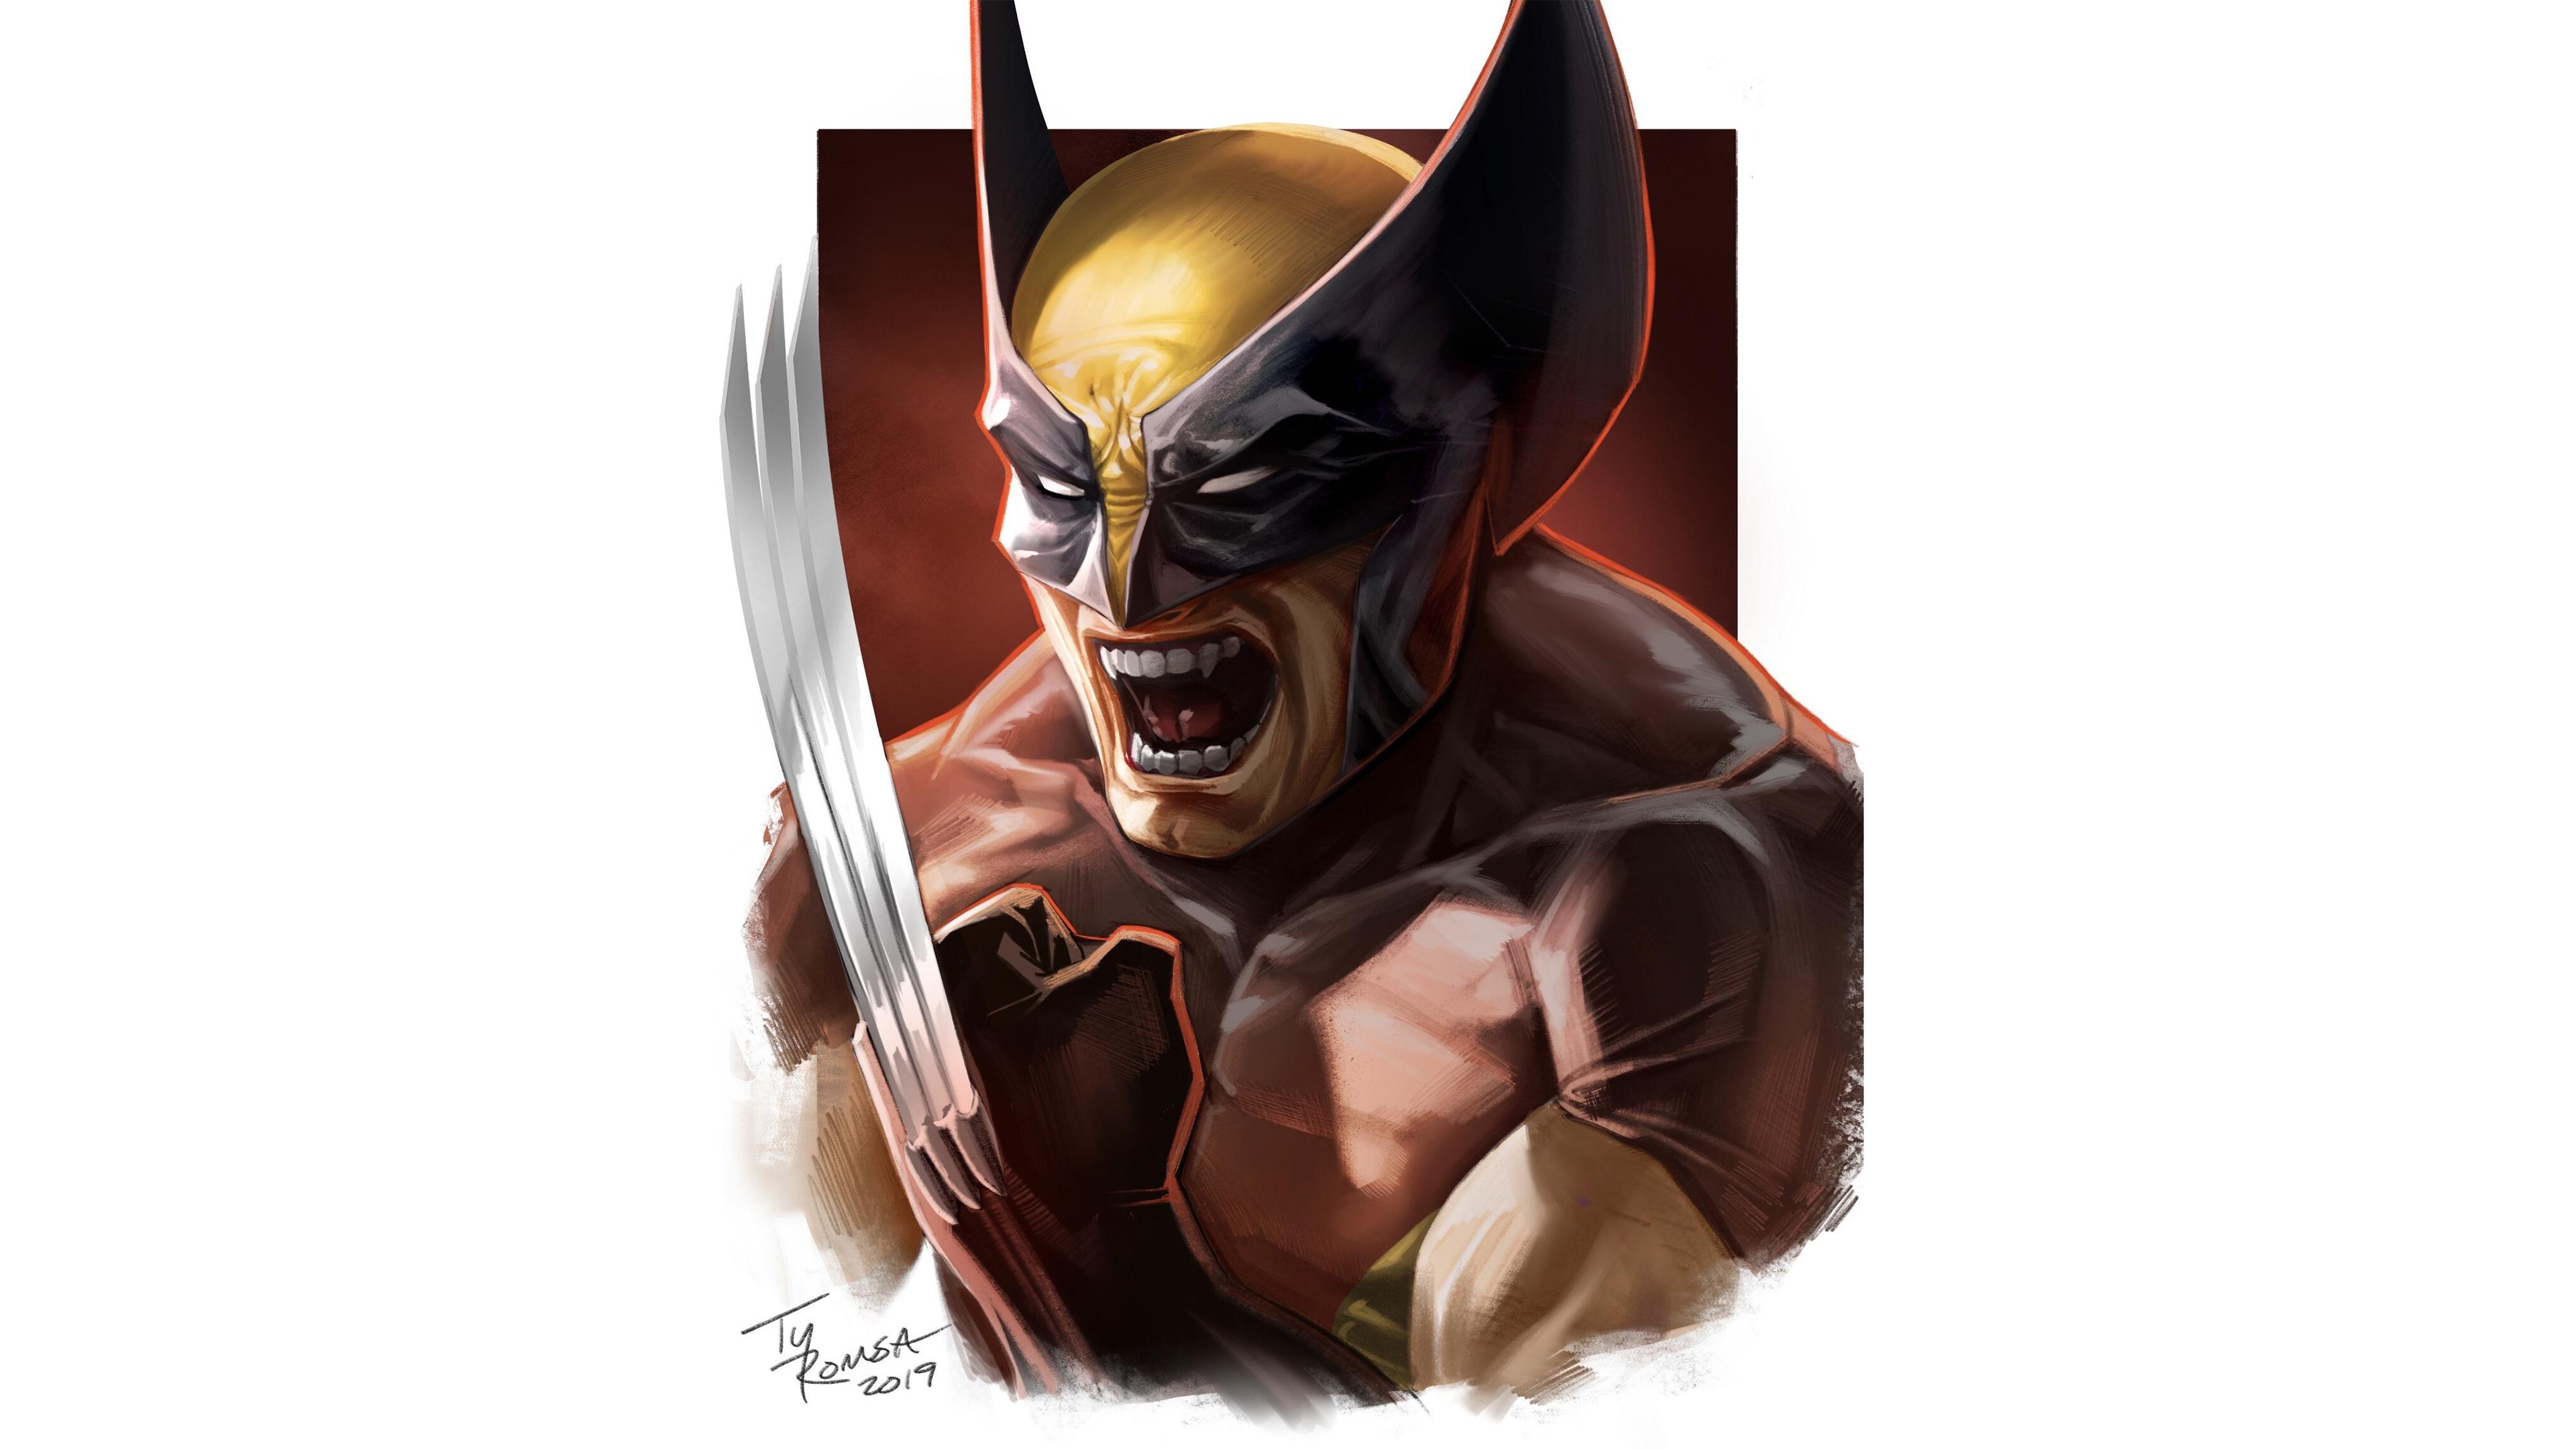 wolverine art 1576093346 - Wolverine Art - wolverine wallpaper phone hd 4k, Wolverine 4k wallpaper, 4k wolverine wallpaper hd